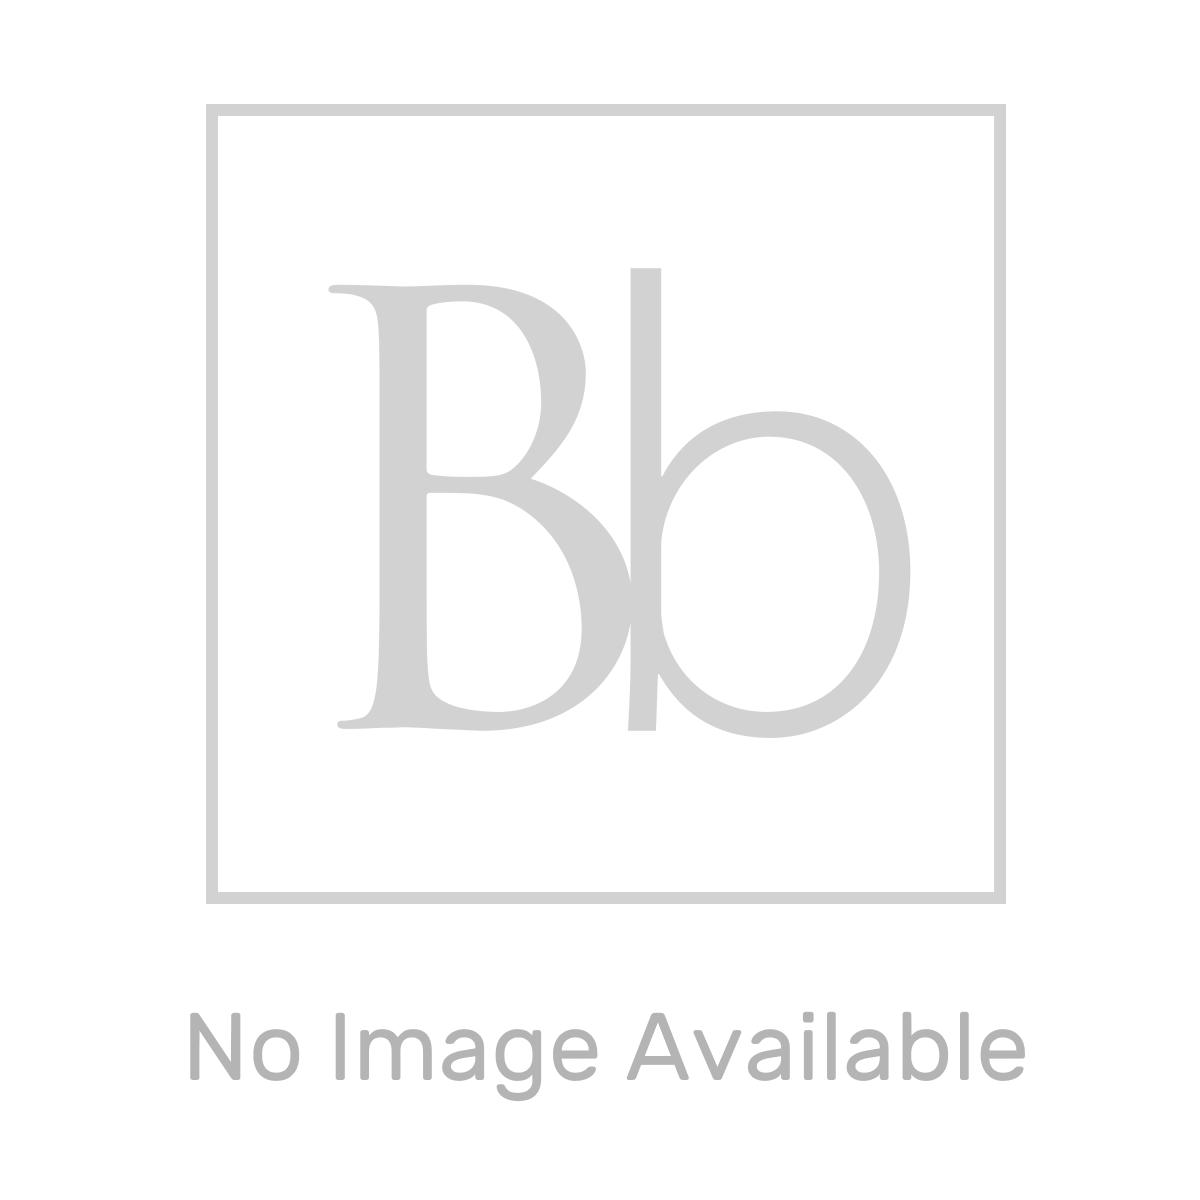 Nuie Athena Stone Grey 2 Door Floor Standing Vanity Unit with 18mm Profile Basin 500mm Line Drawing